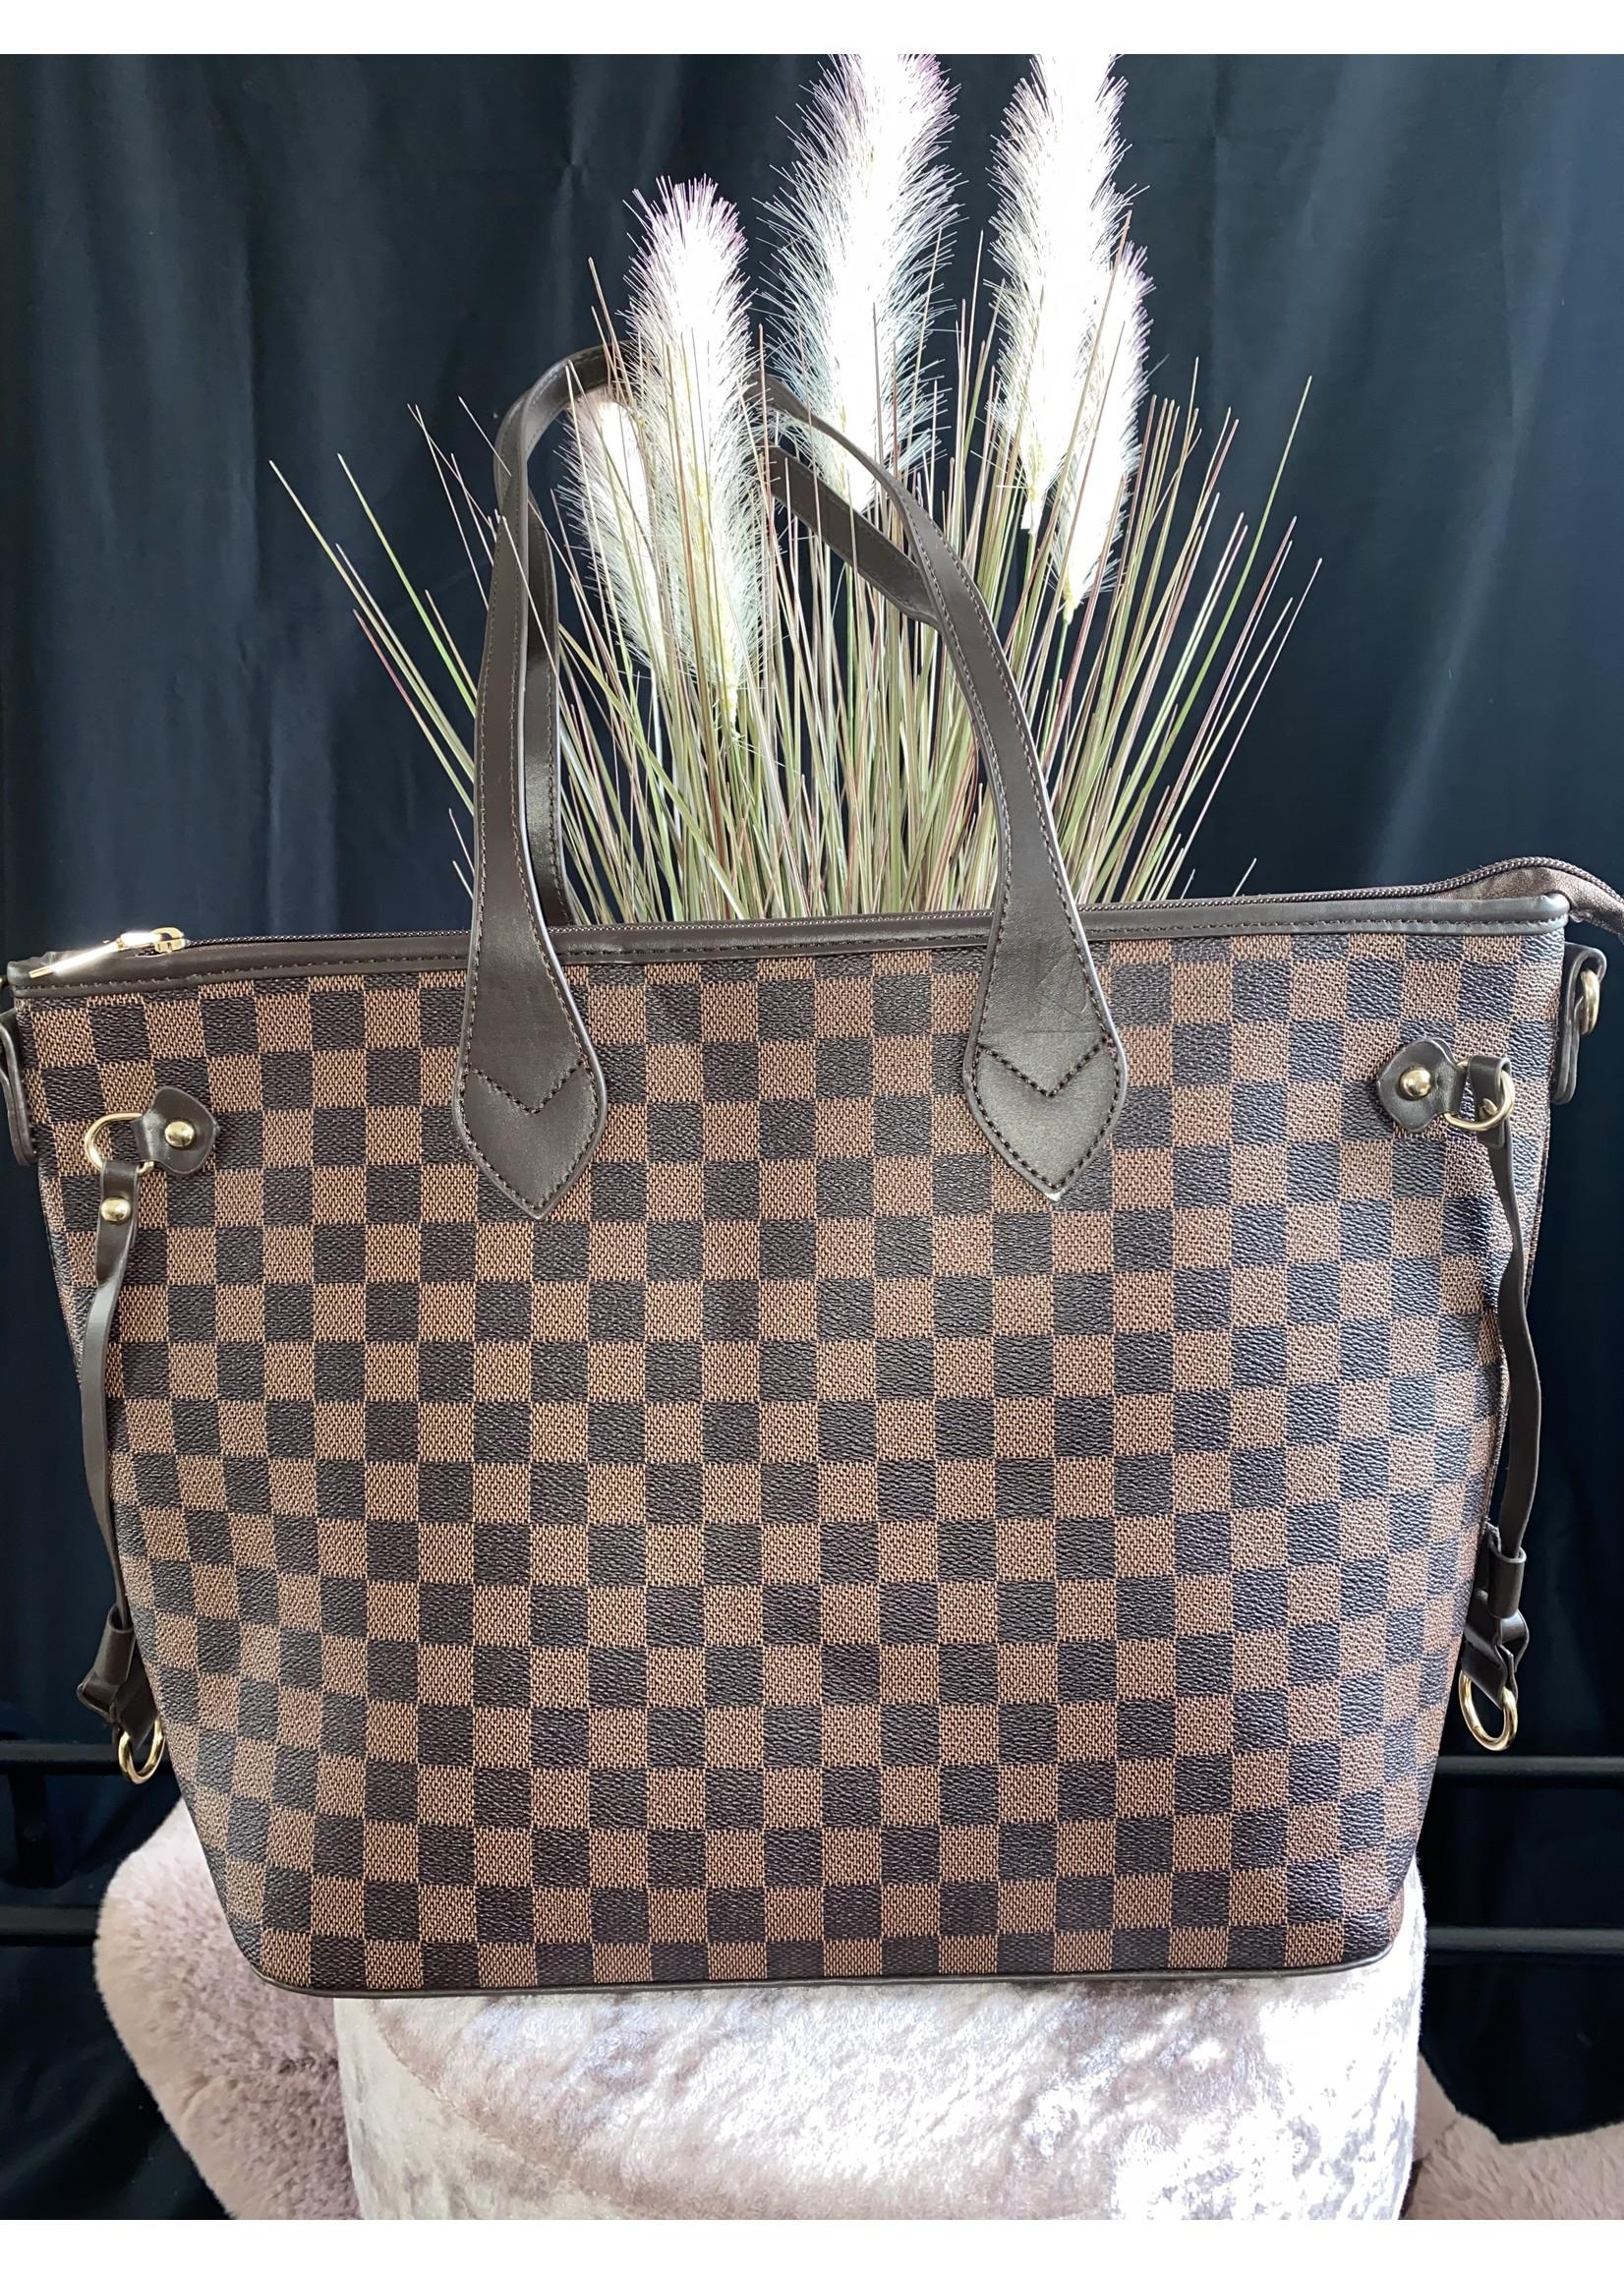 Luciana shopper bag